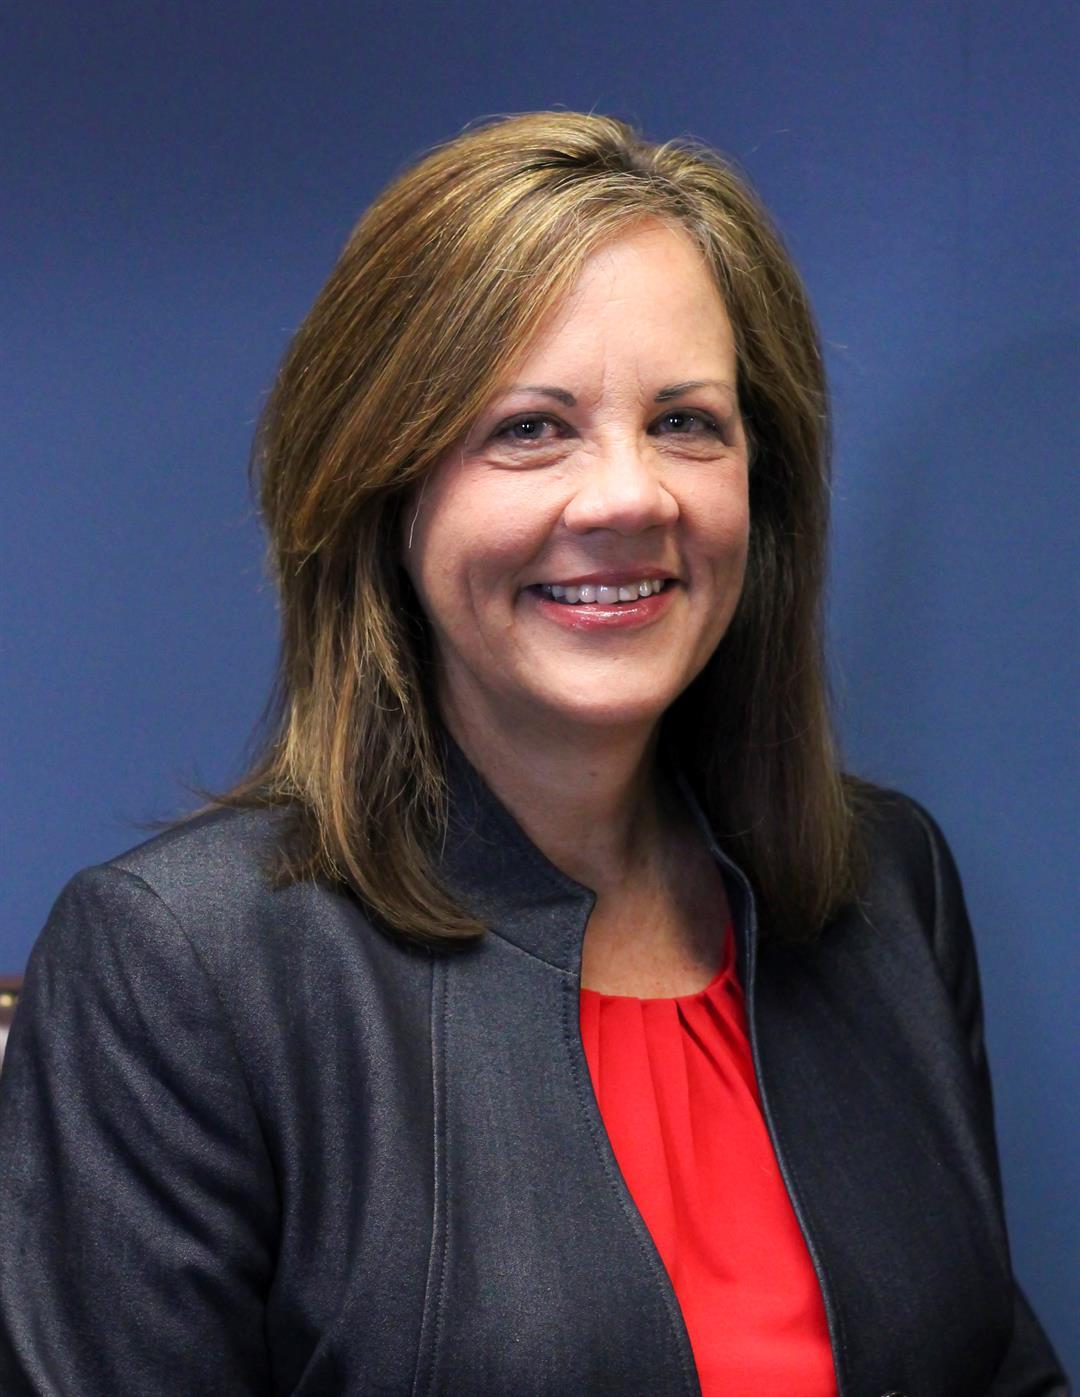 Theresa Kenney